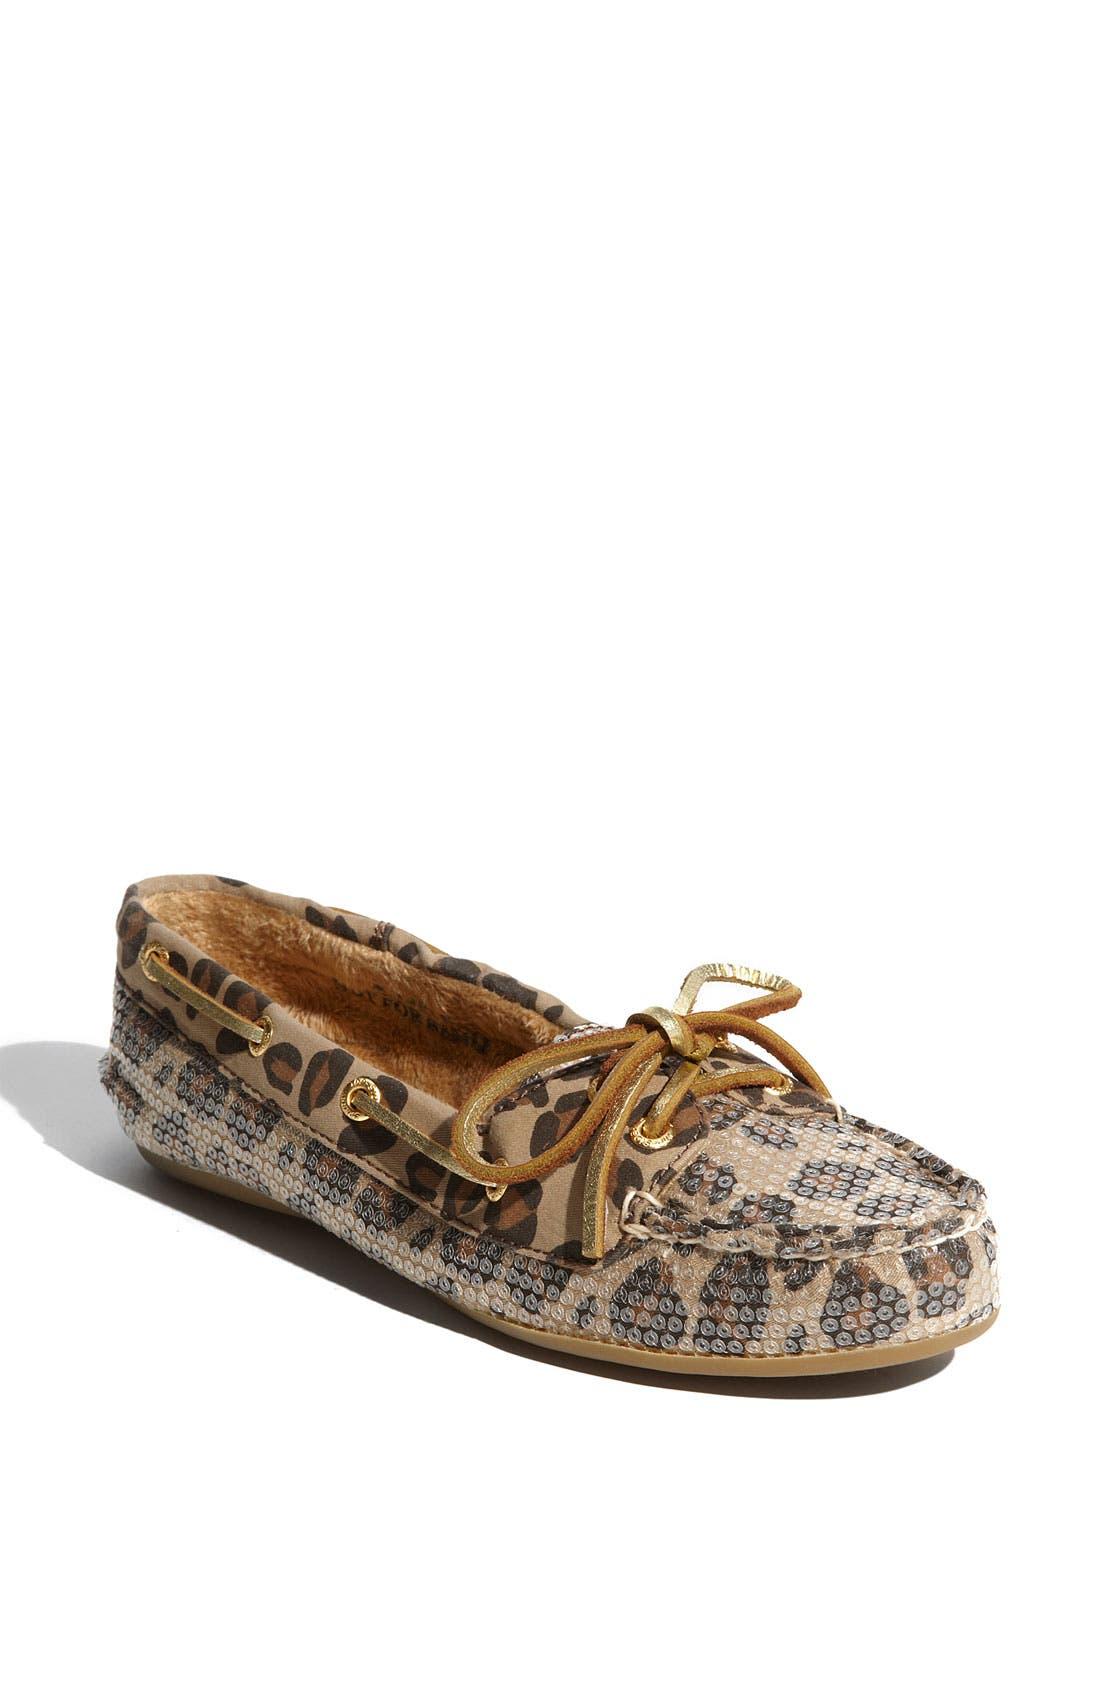 Top-Sider<sup>®</sup> 'Skiff' Moccasin Slip-On,                         Main,                         color, Leopard Sequins